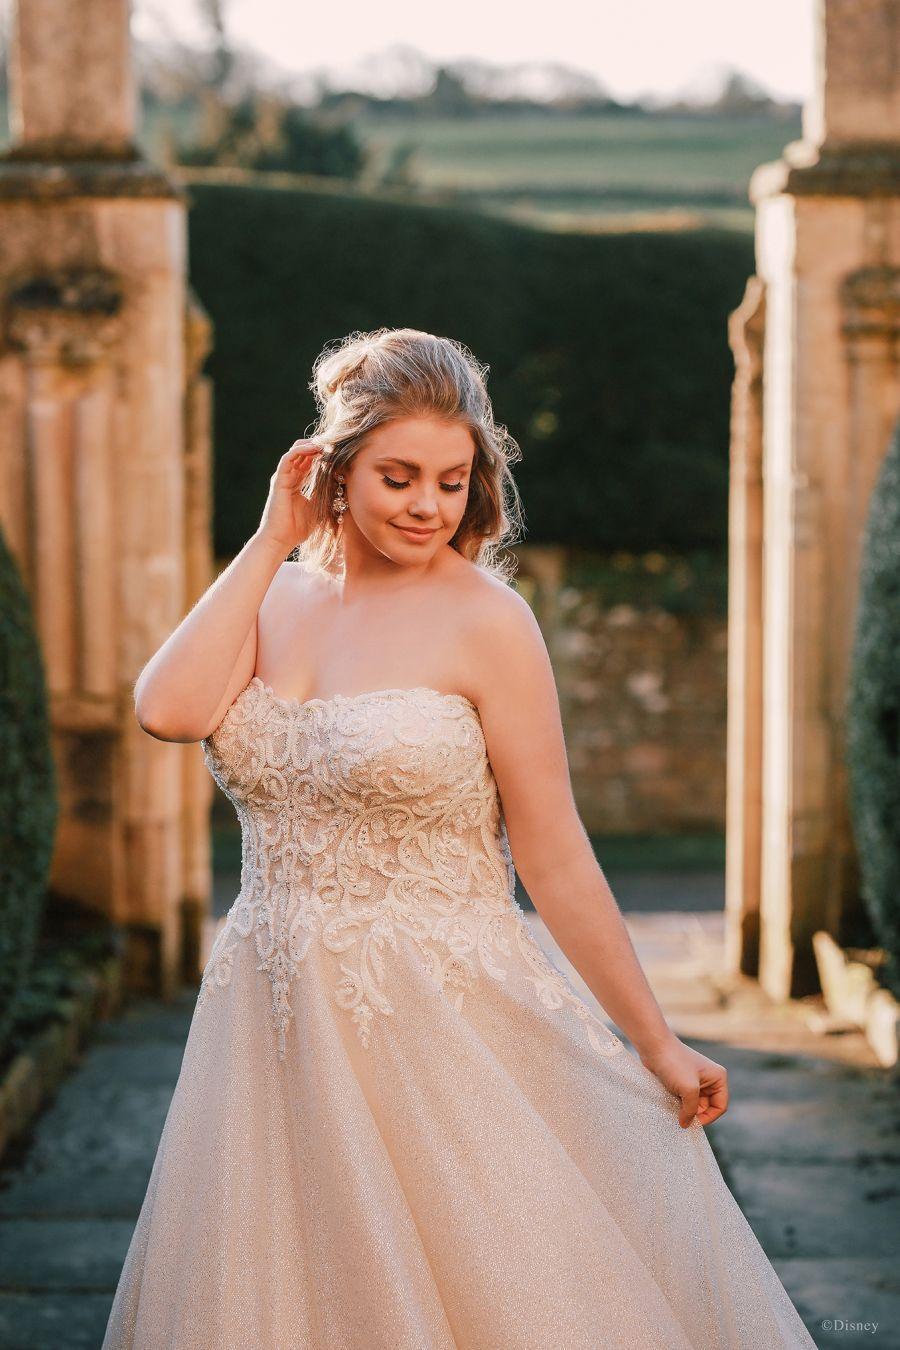 Style D293 Cinderella Allure Bridals In 2021 Disney Wedding Dresses Wedding Dresses Wedding Dresses Cinderella [ 1350 x 900 Pixel ]